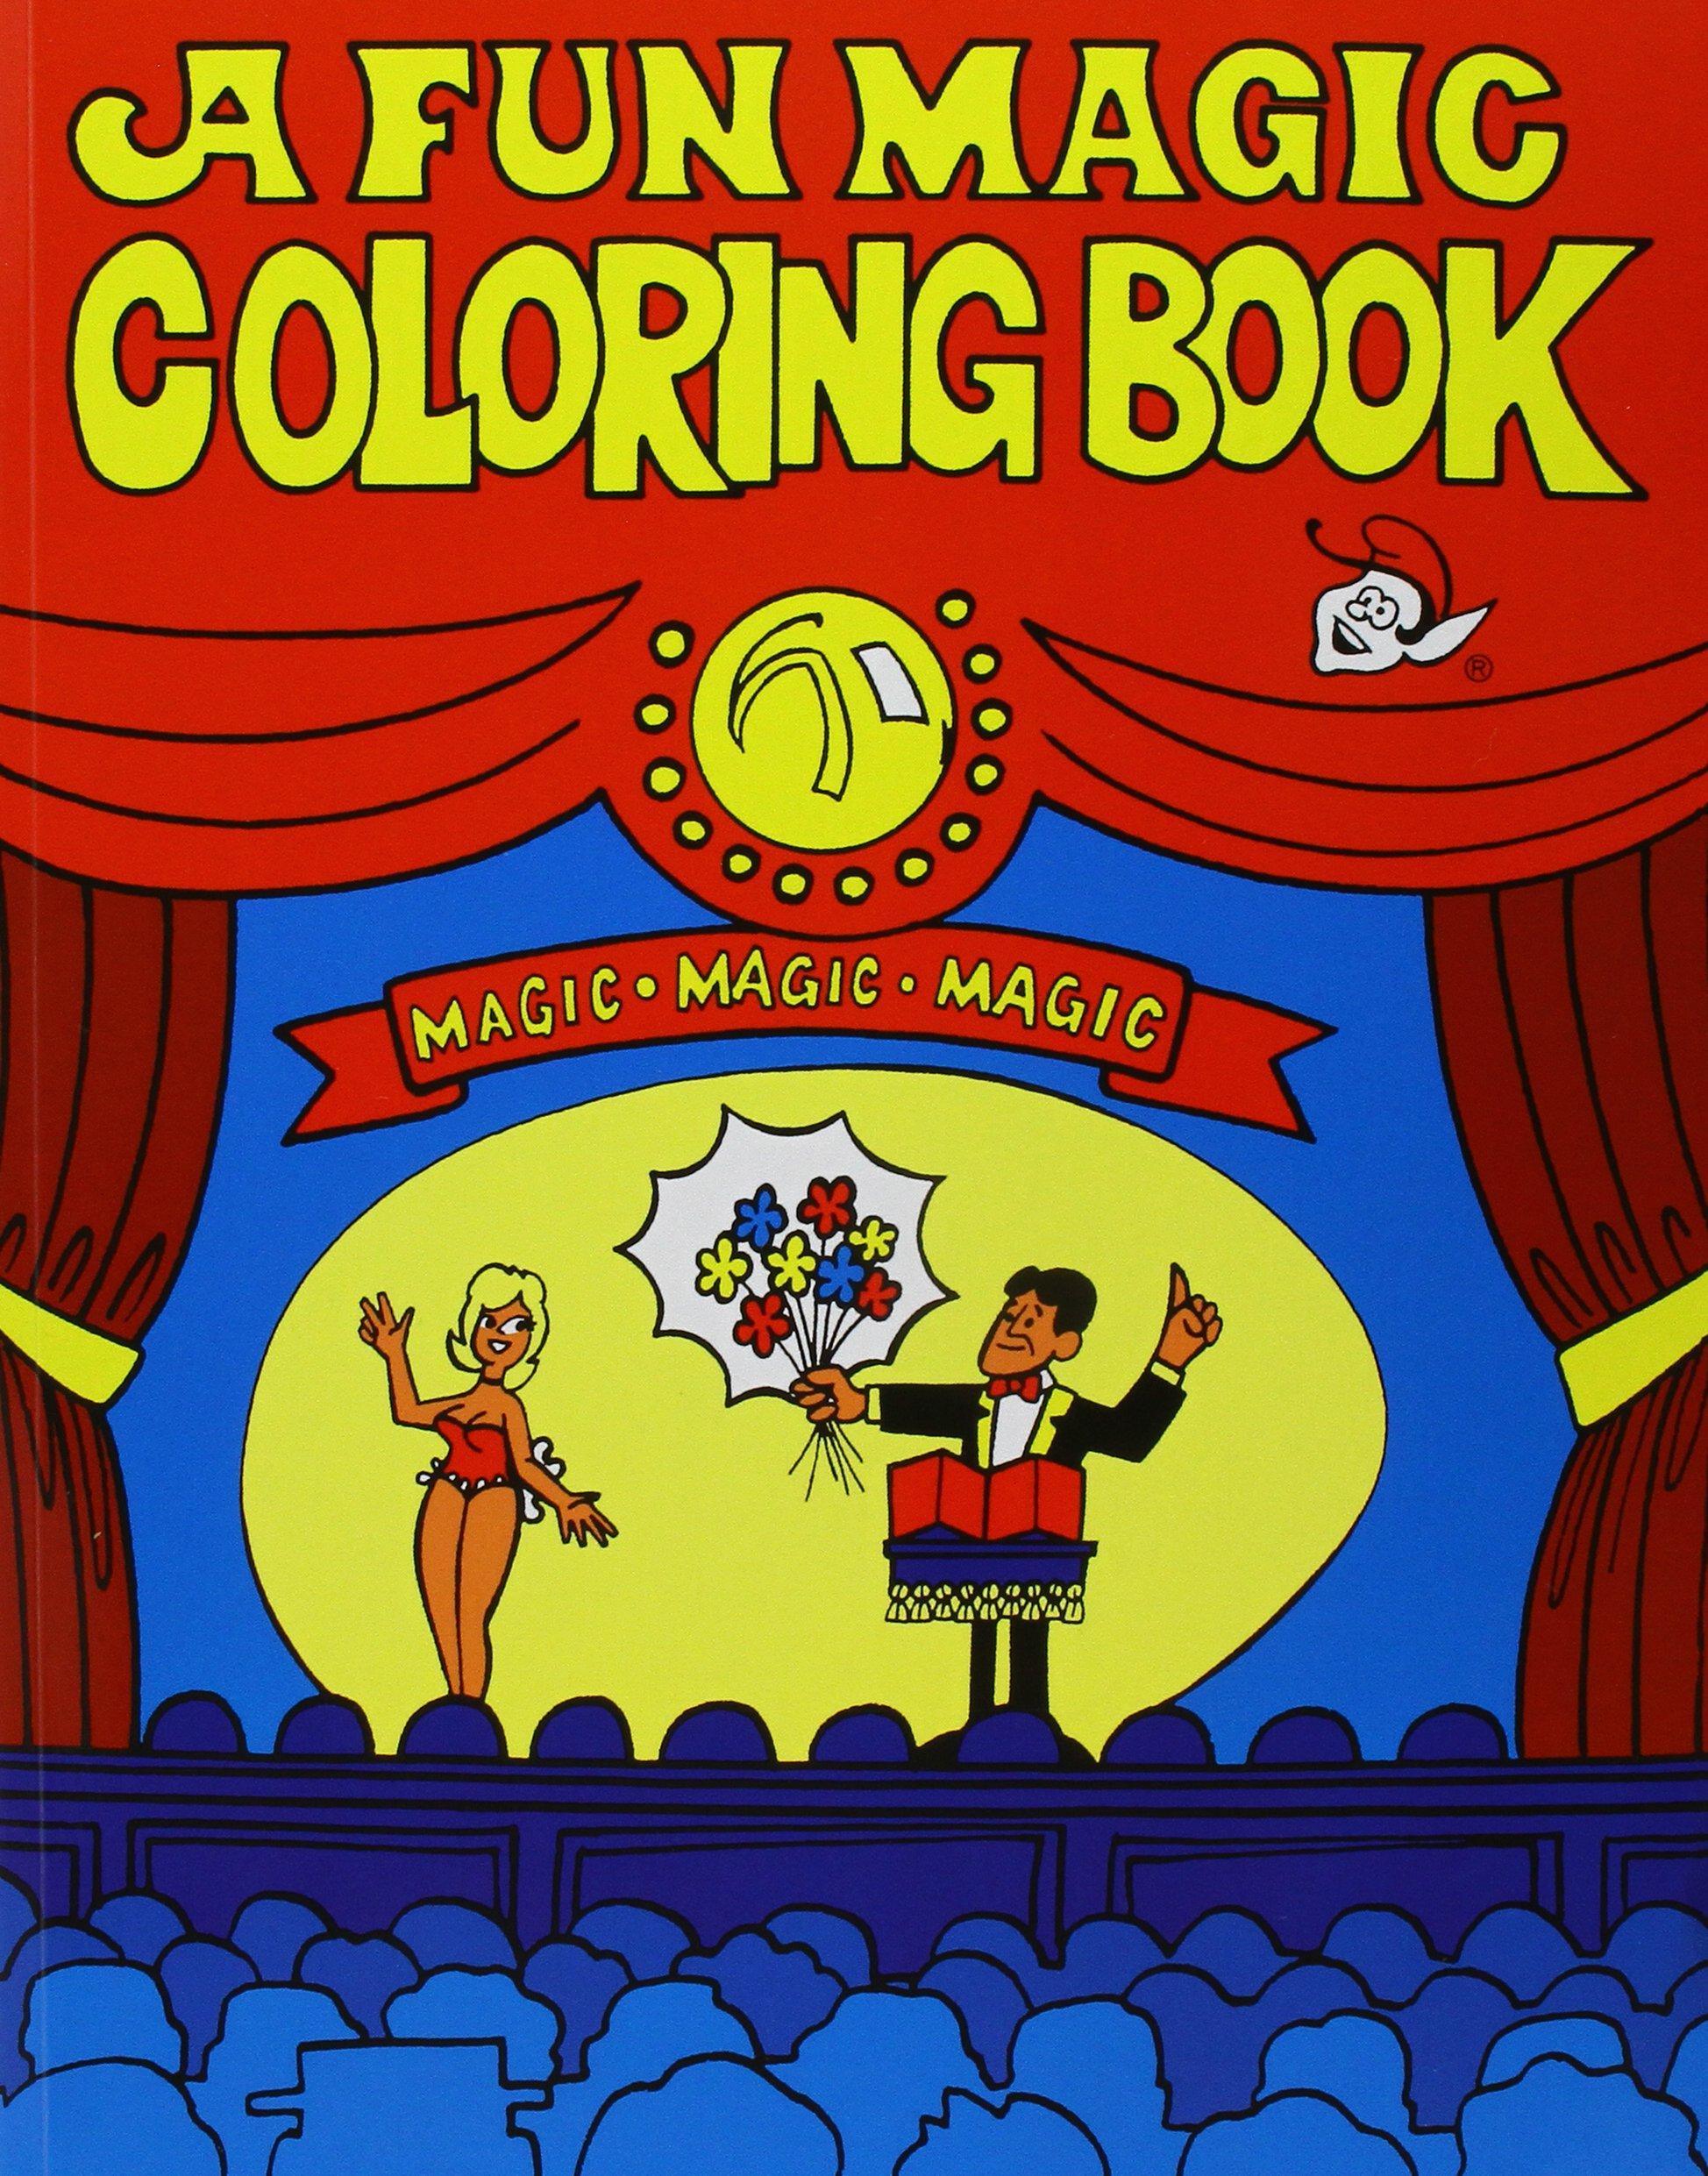 Cheap Fun Magic Coloring Book Find Deals On